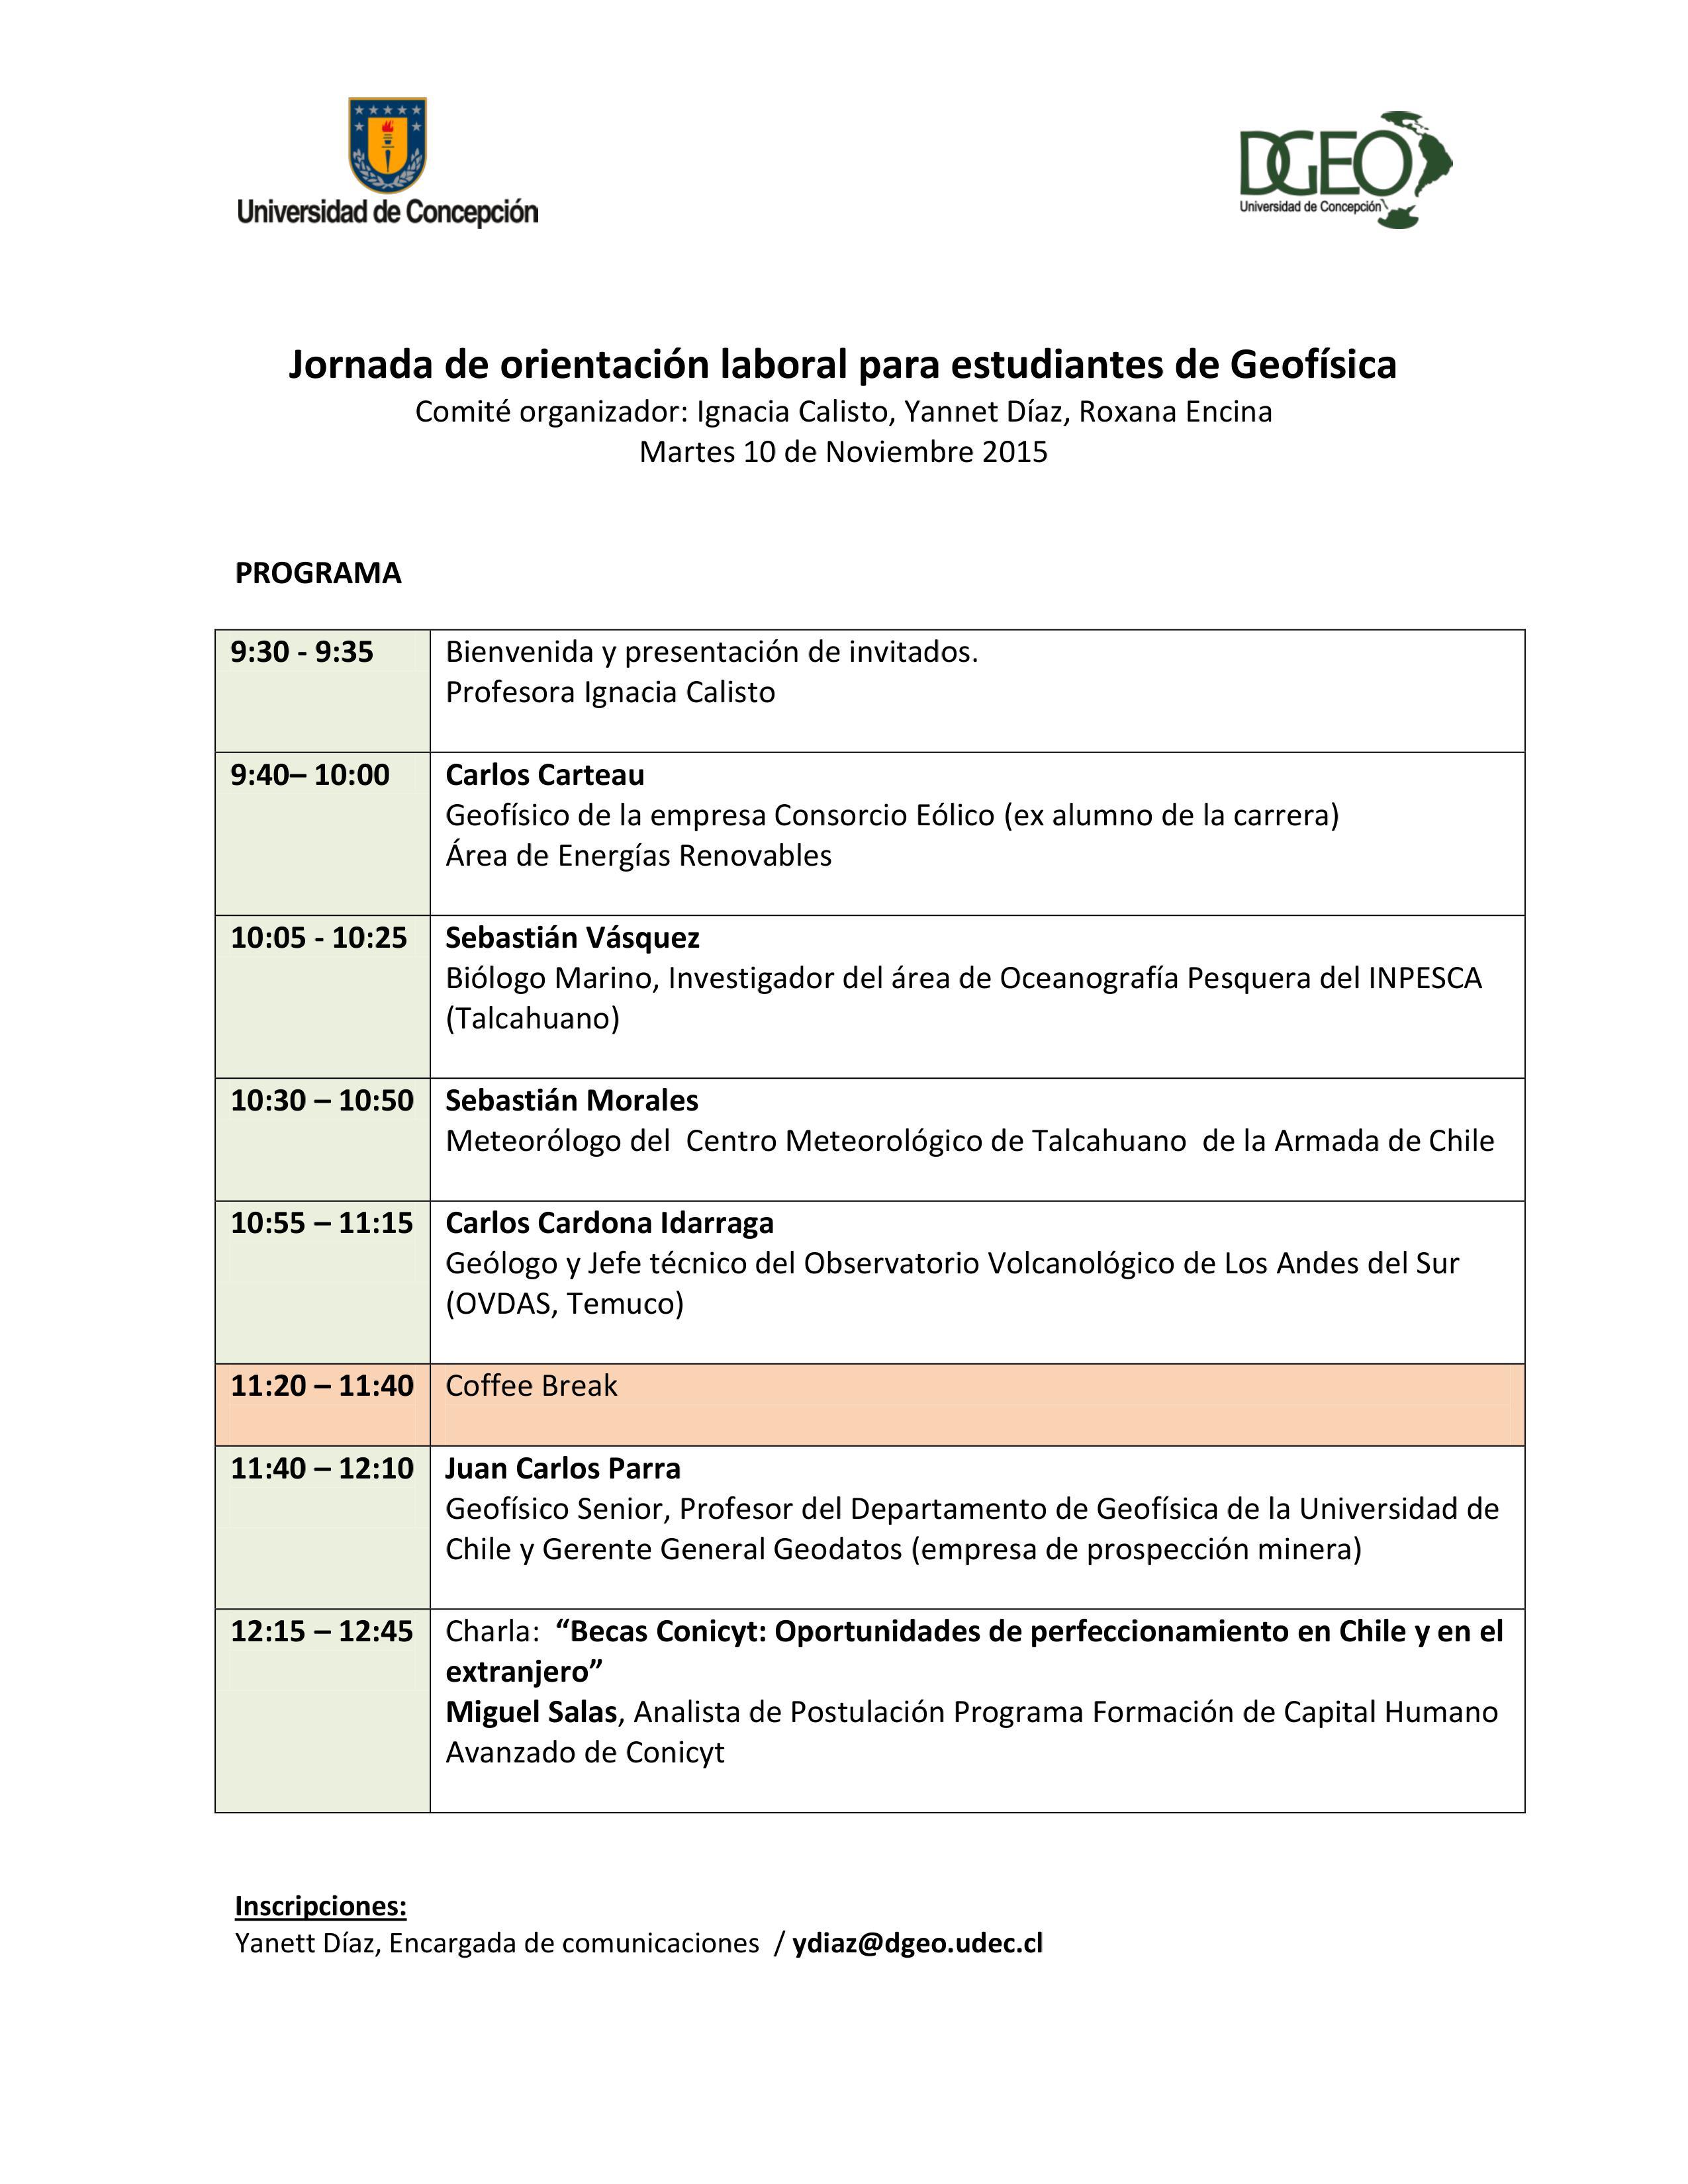 Programa orientacion laboral 2015